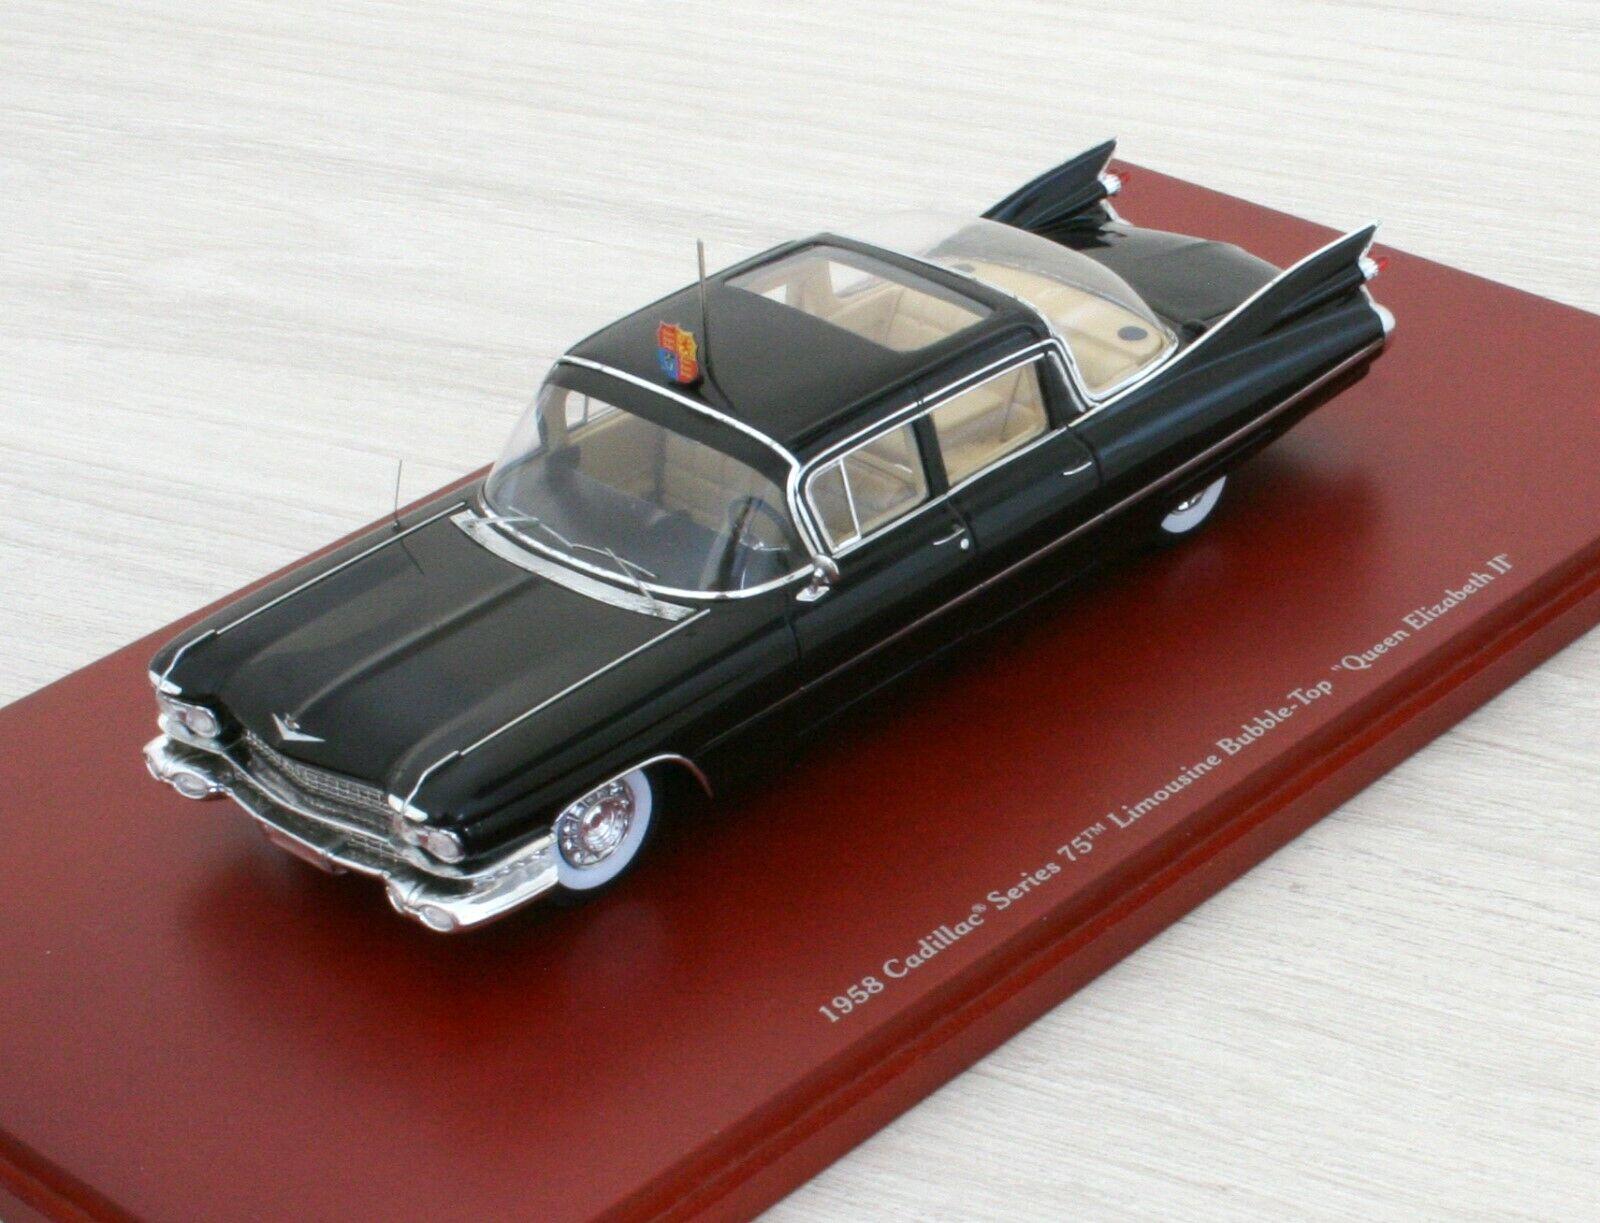 CADILLAC Series 75 Limousine Bubble-Top - Queen Elisabeth II - TRUESCALE - 1 43